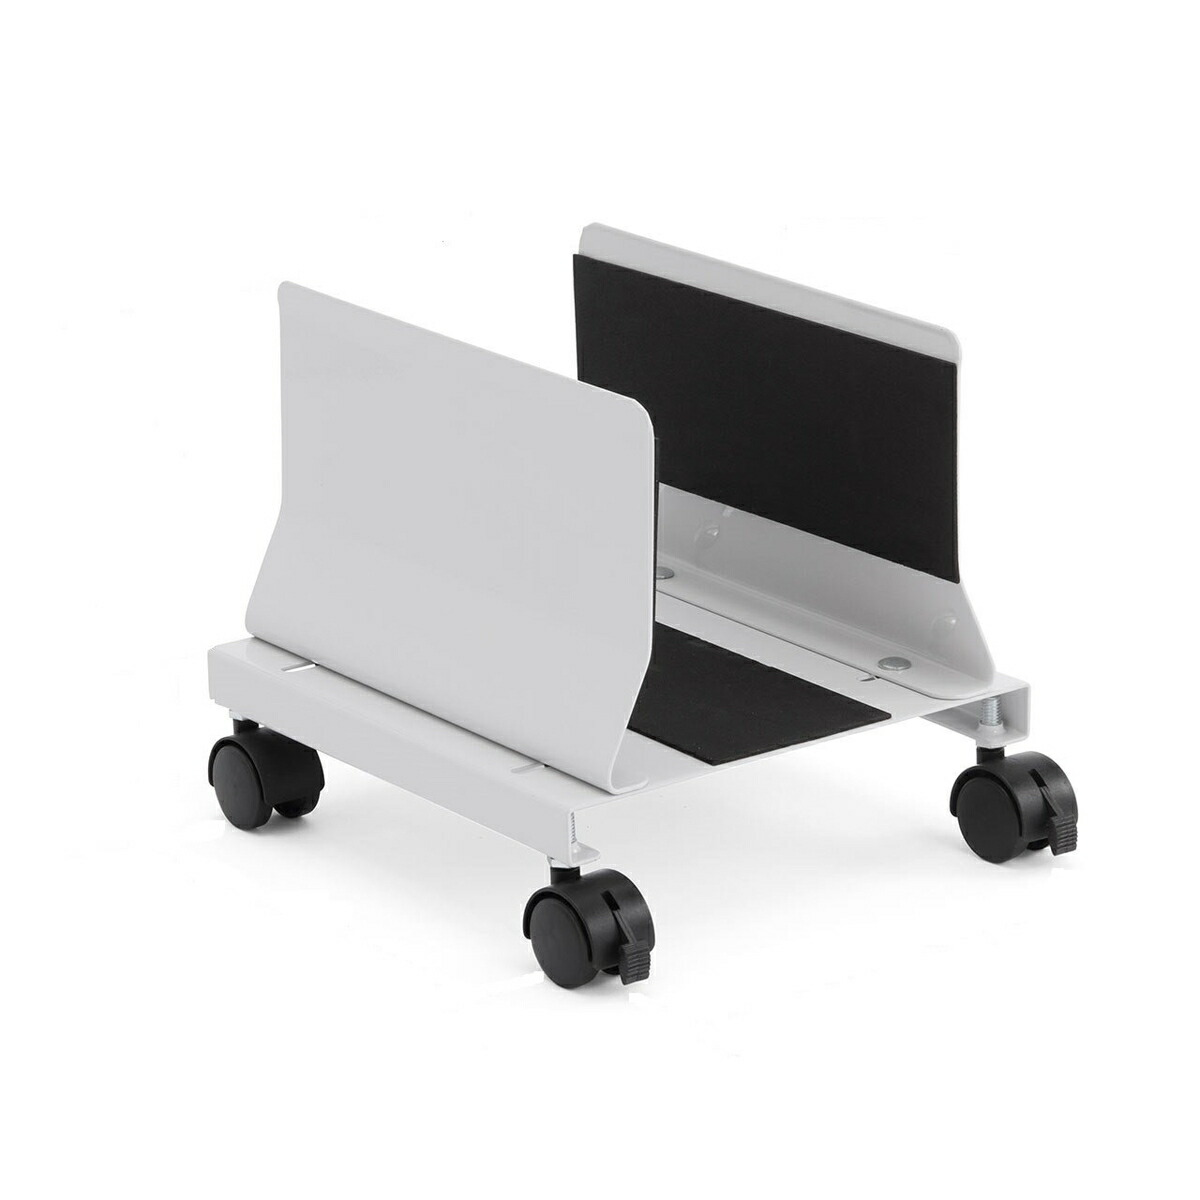 [100-CPU003]【サンワダイレクト限定品】【送料無料】 CPUスタンド デスクトップ用 パソコン本体設置用 キャスター付き 幅13.2cm~22cm 無段階調節 スチール製 パソコンスタンド